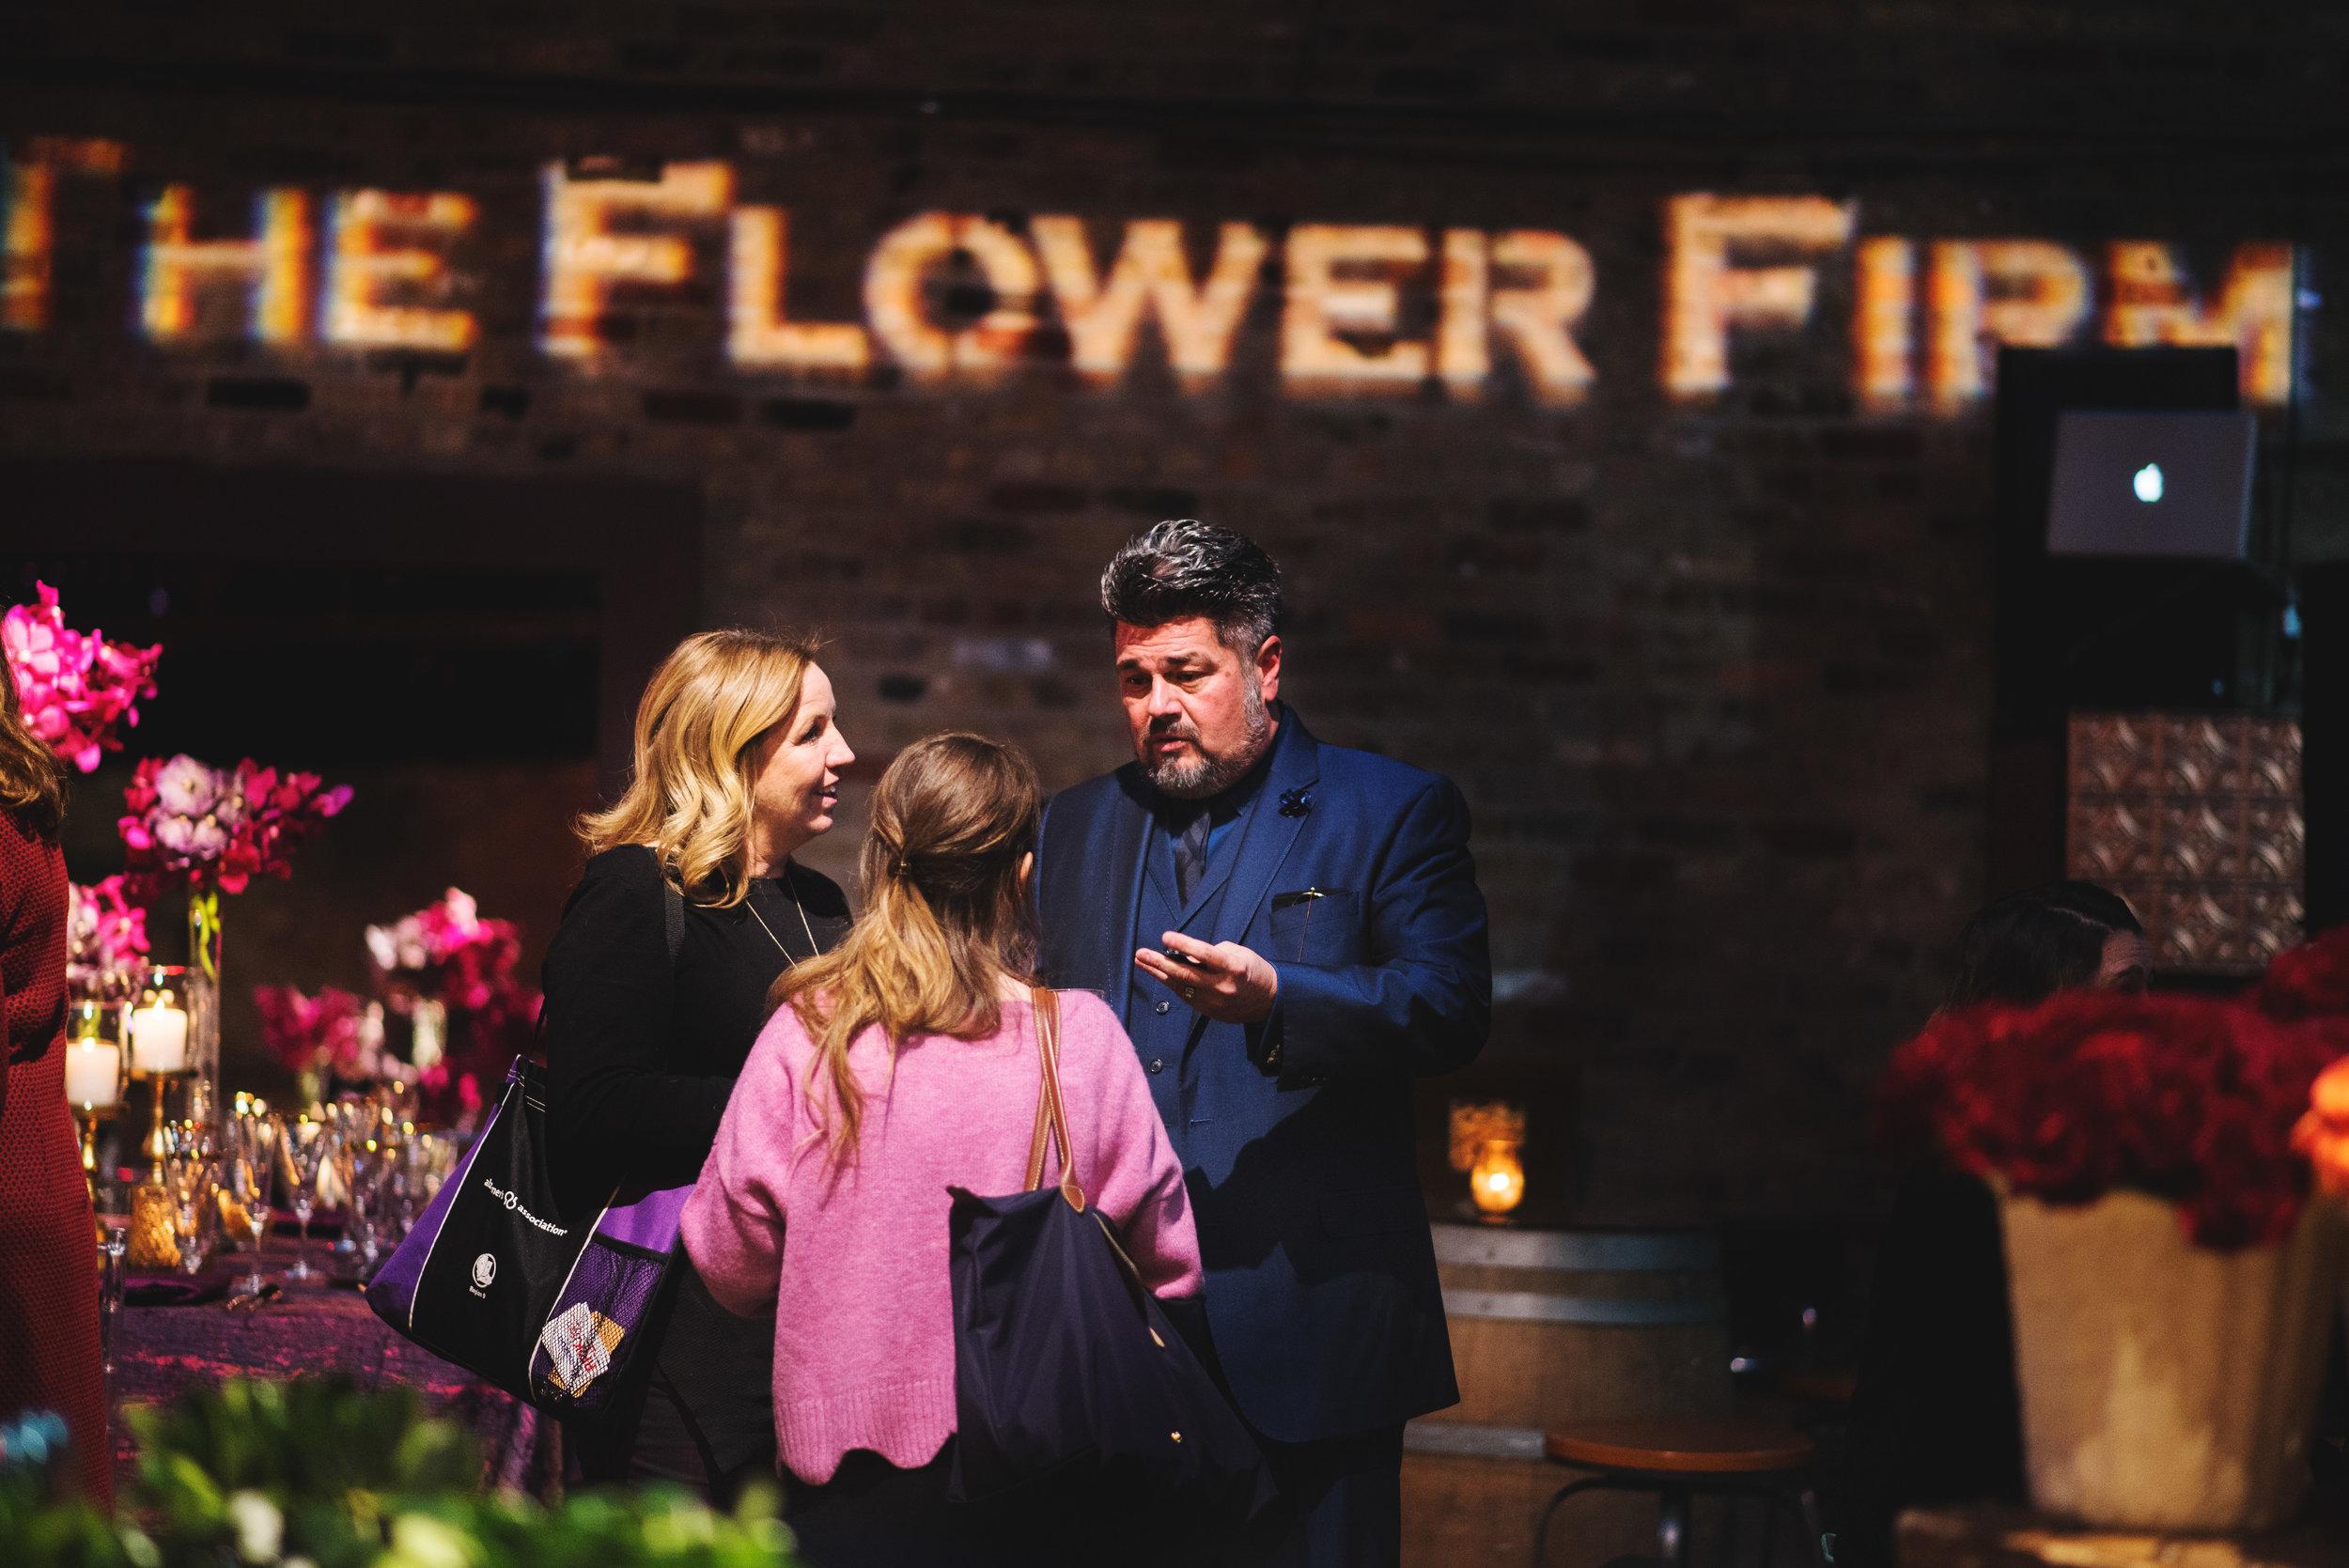 TheFlowerFirm-Event-Chicago00049.jpg